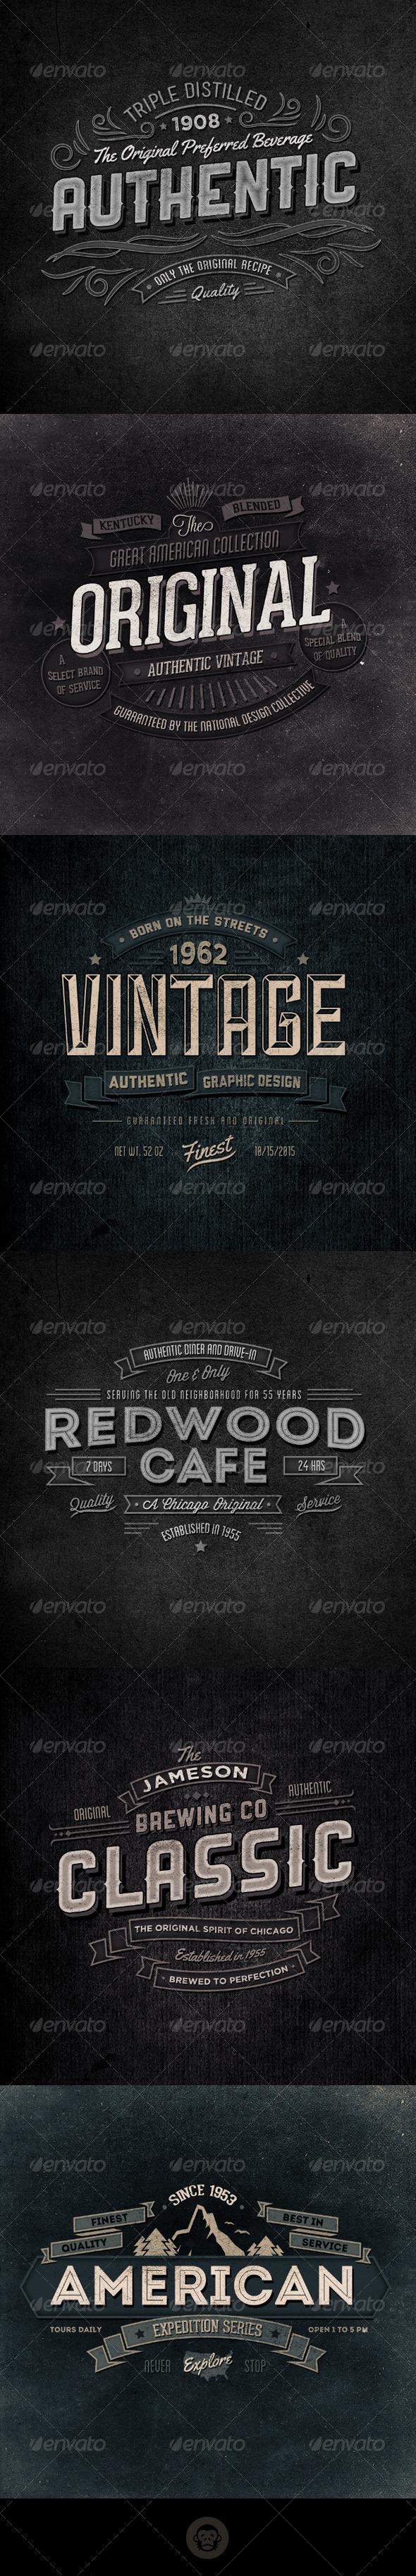 Retro Typographic Insignia and Badges Vol 2 - Badges & Stickers Web Elements